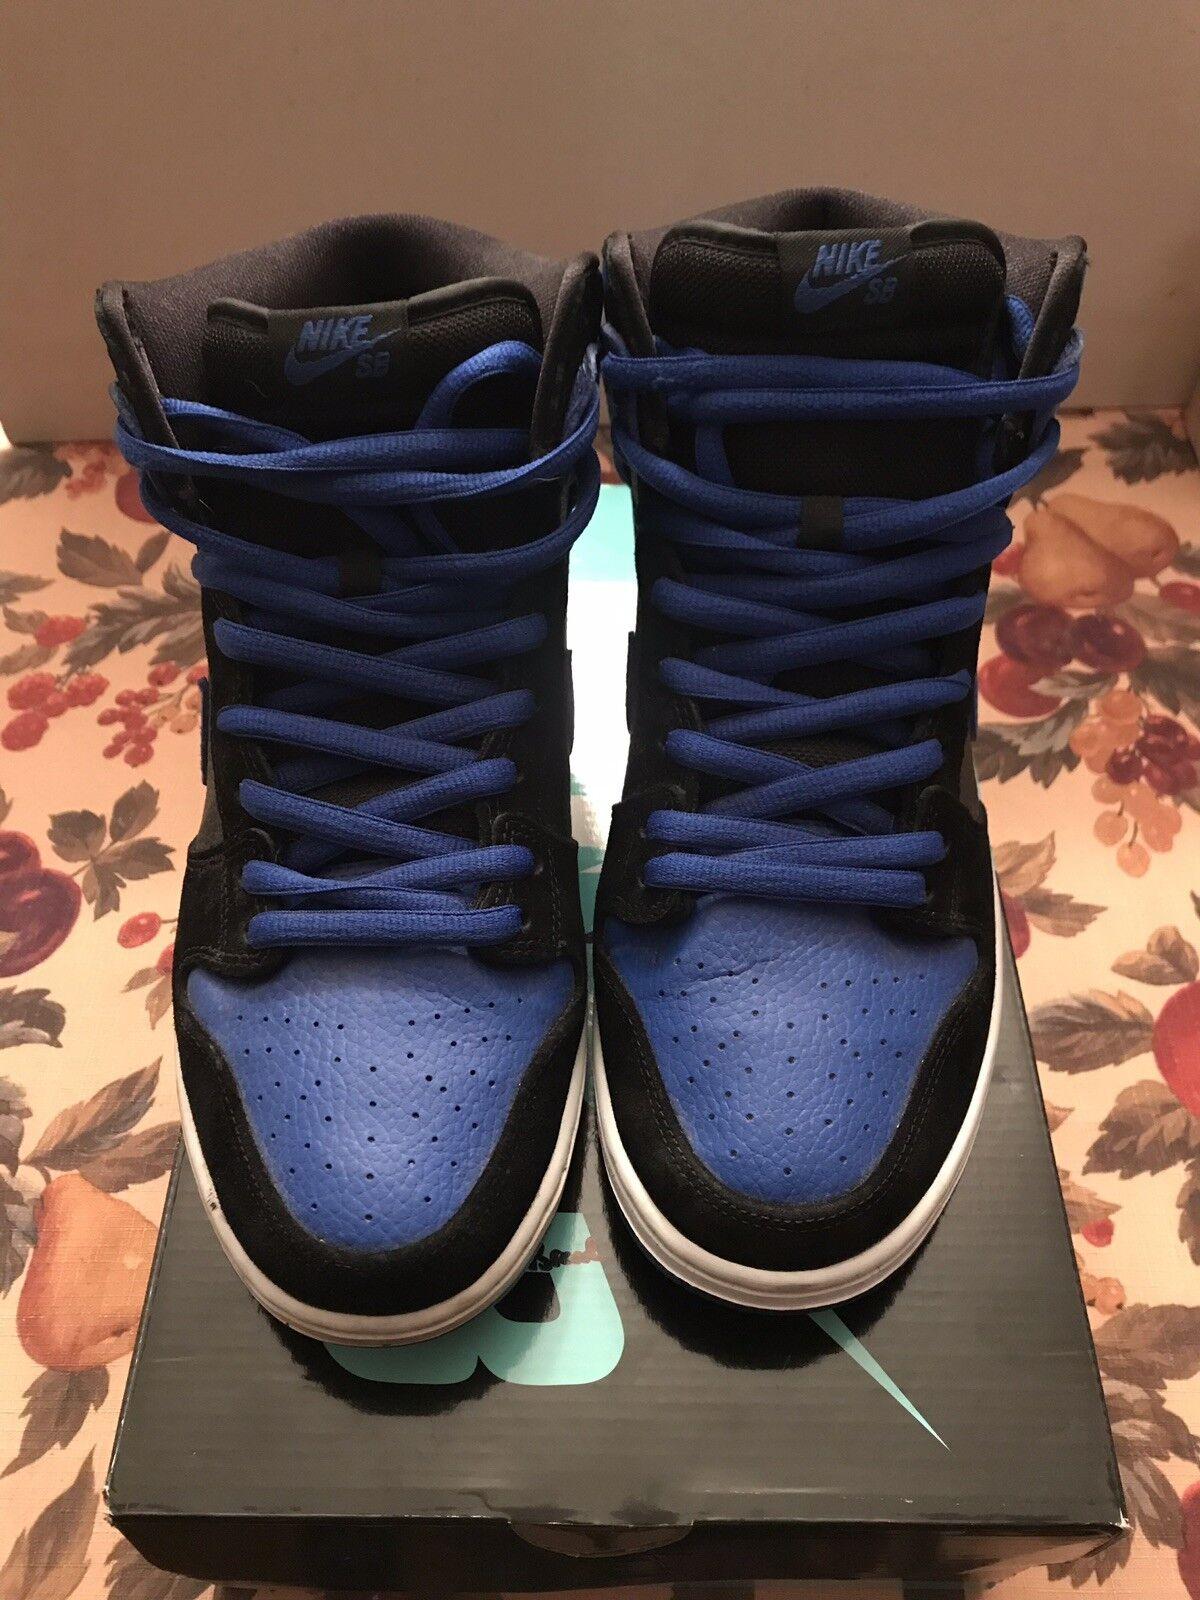 Nike SB Dunk Royal bluee High Top - Not Pidgon Jordan Paul Rodrigez - Sz 12 -NICE